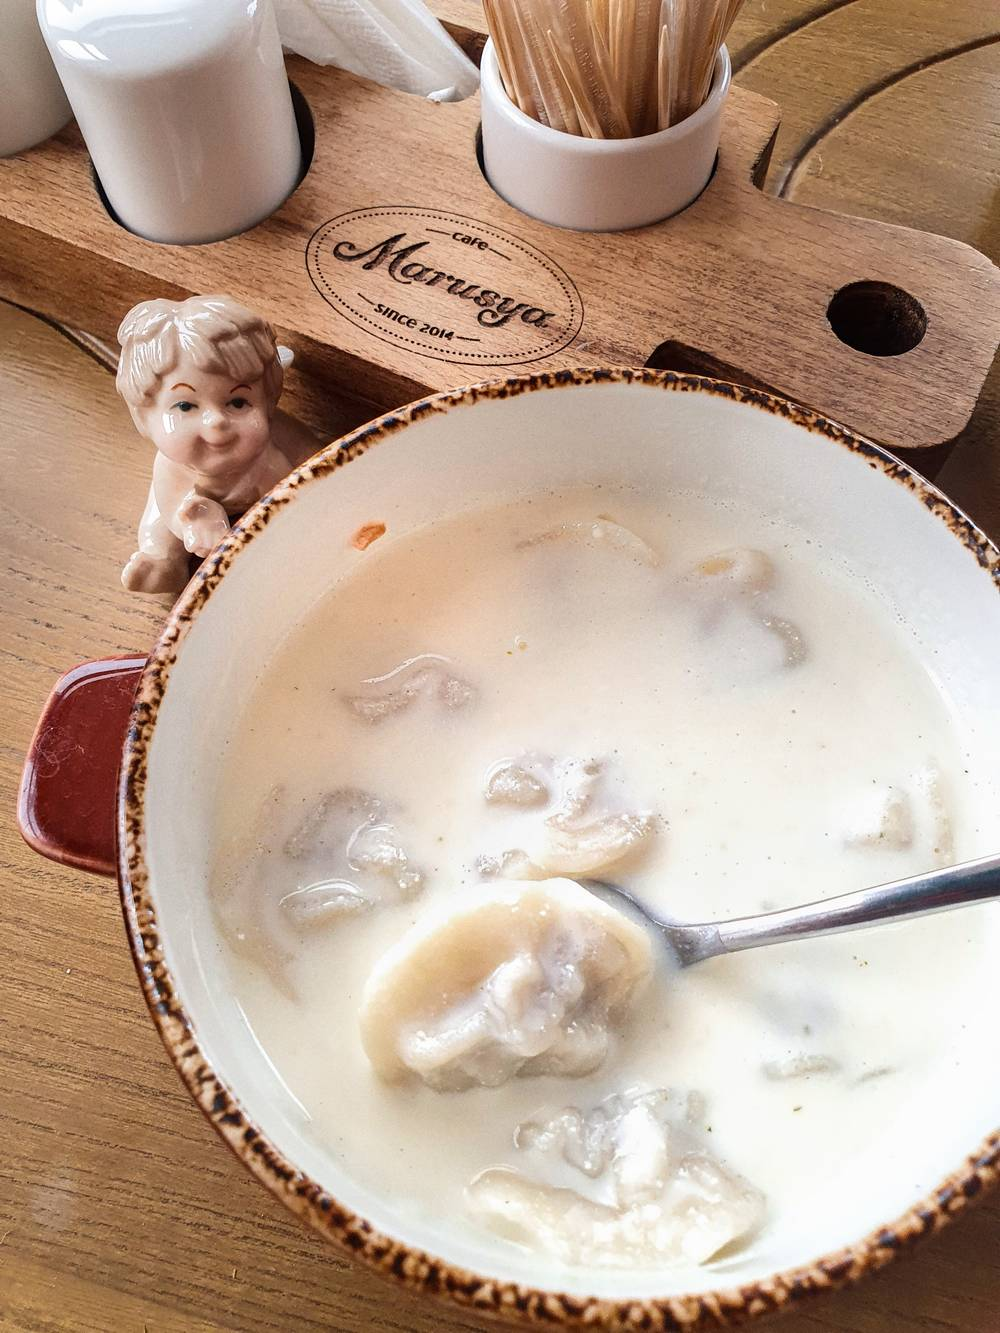 Сырный суп с пельмешками доставка еды Волгоград кафе Marusya Маруся Дома